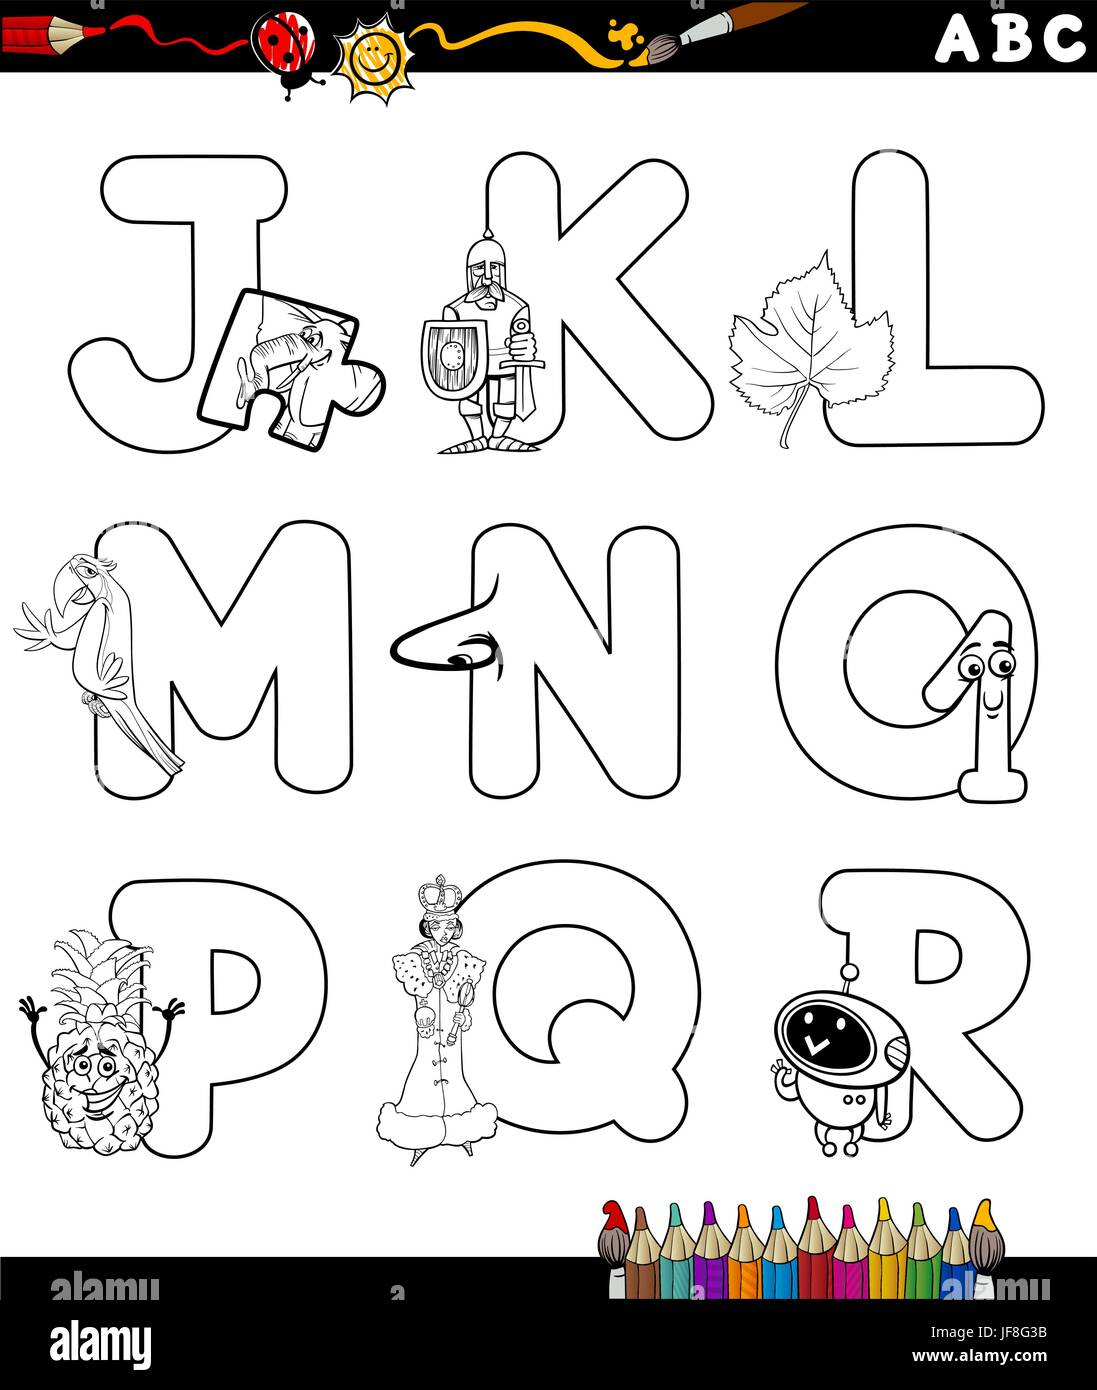 Cartoon-Alphabet-Malvorlagen Stock-Vektorgrafik - Alamy